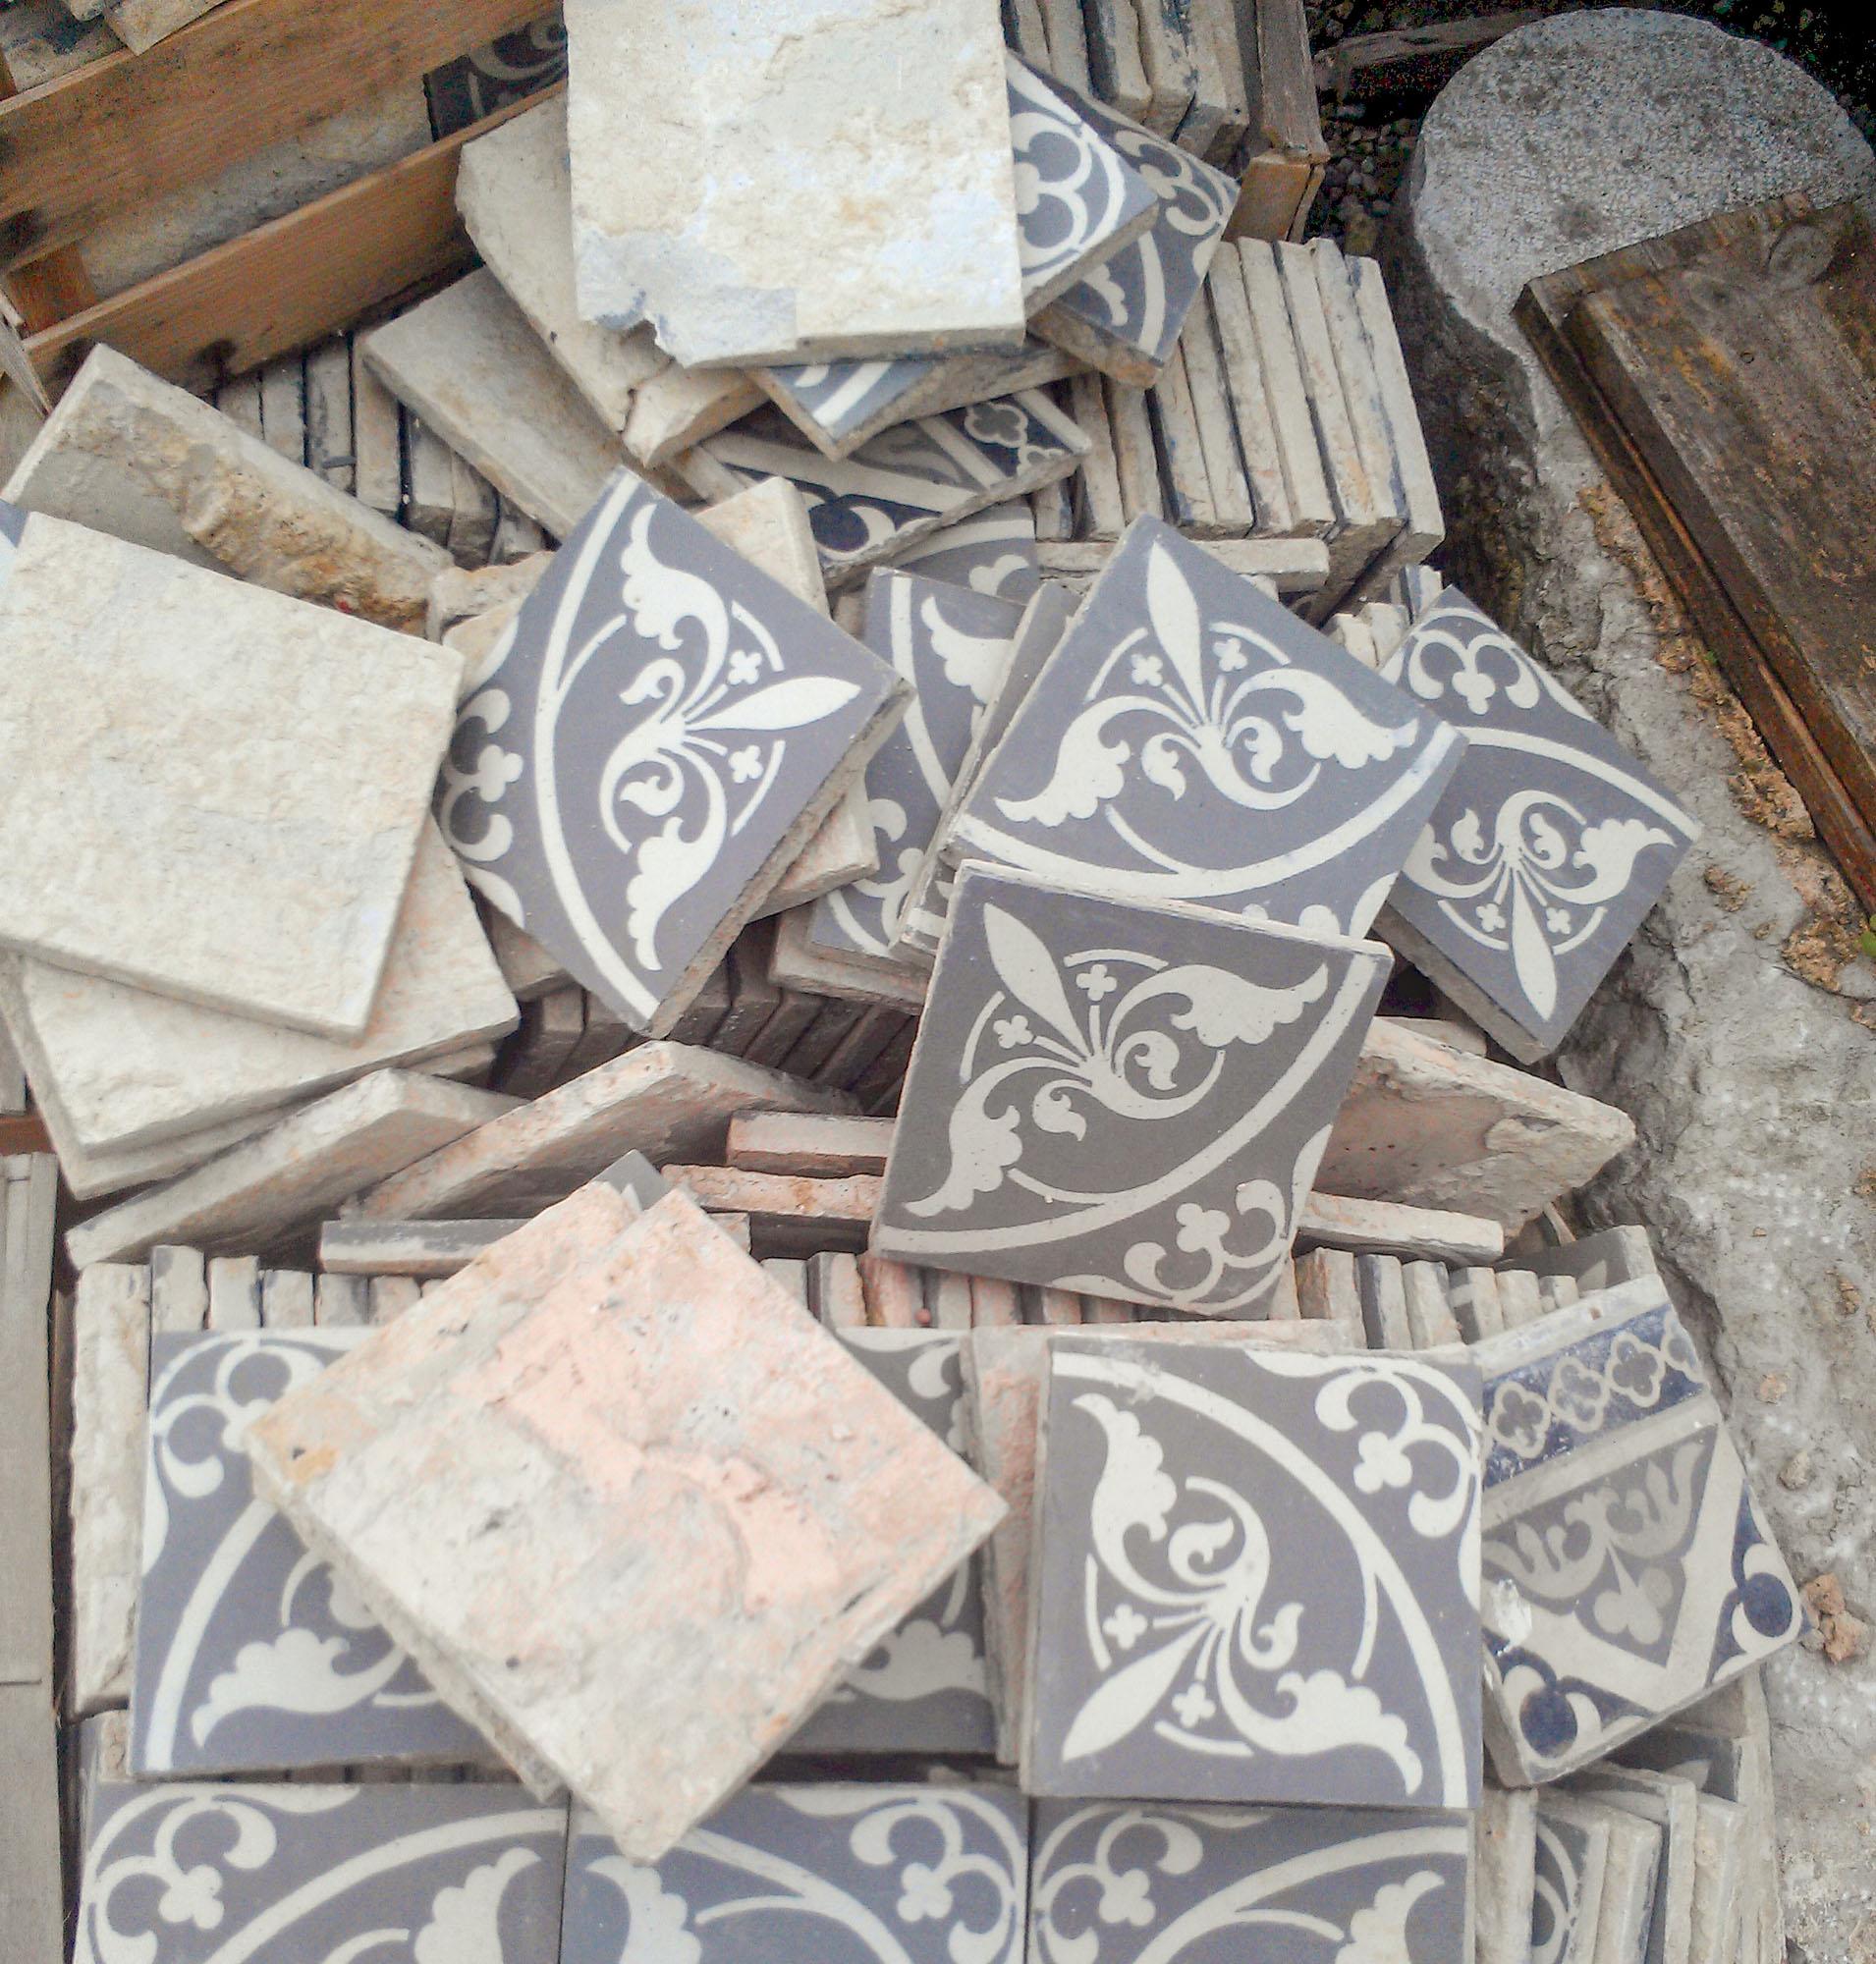 Reclaimed Victorian-era encaustic tiles await a new purpose.